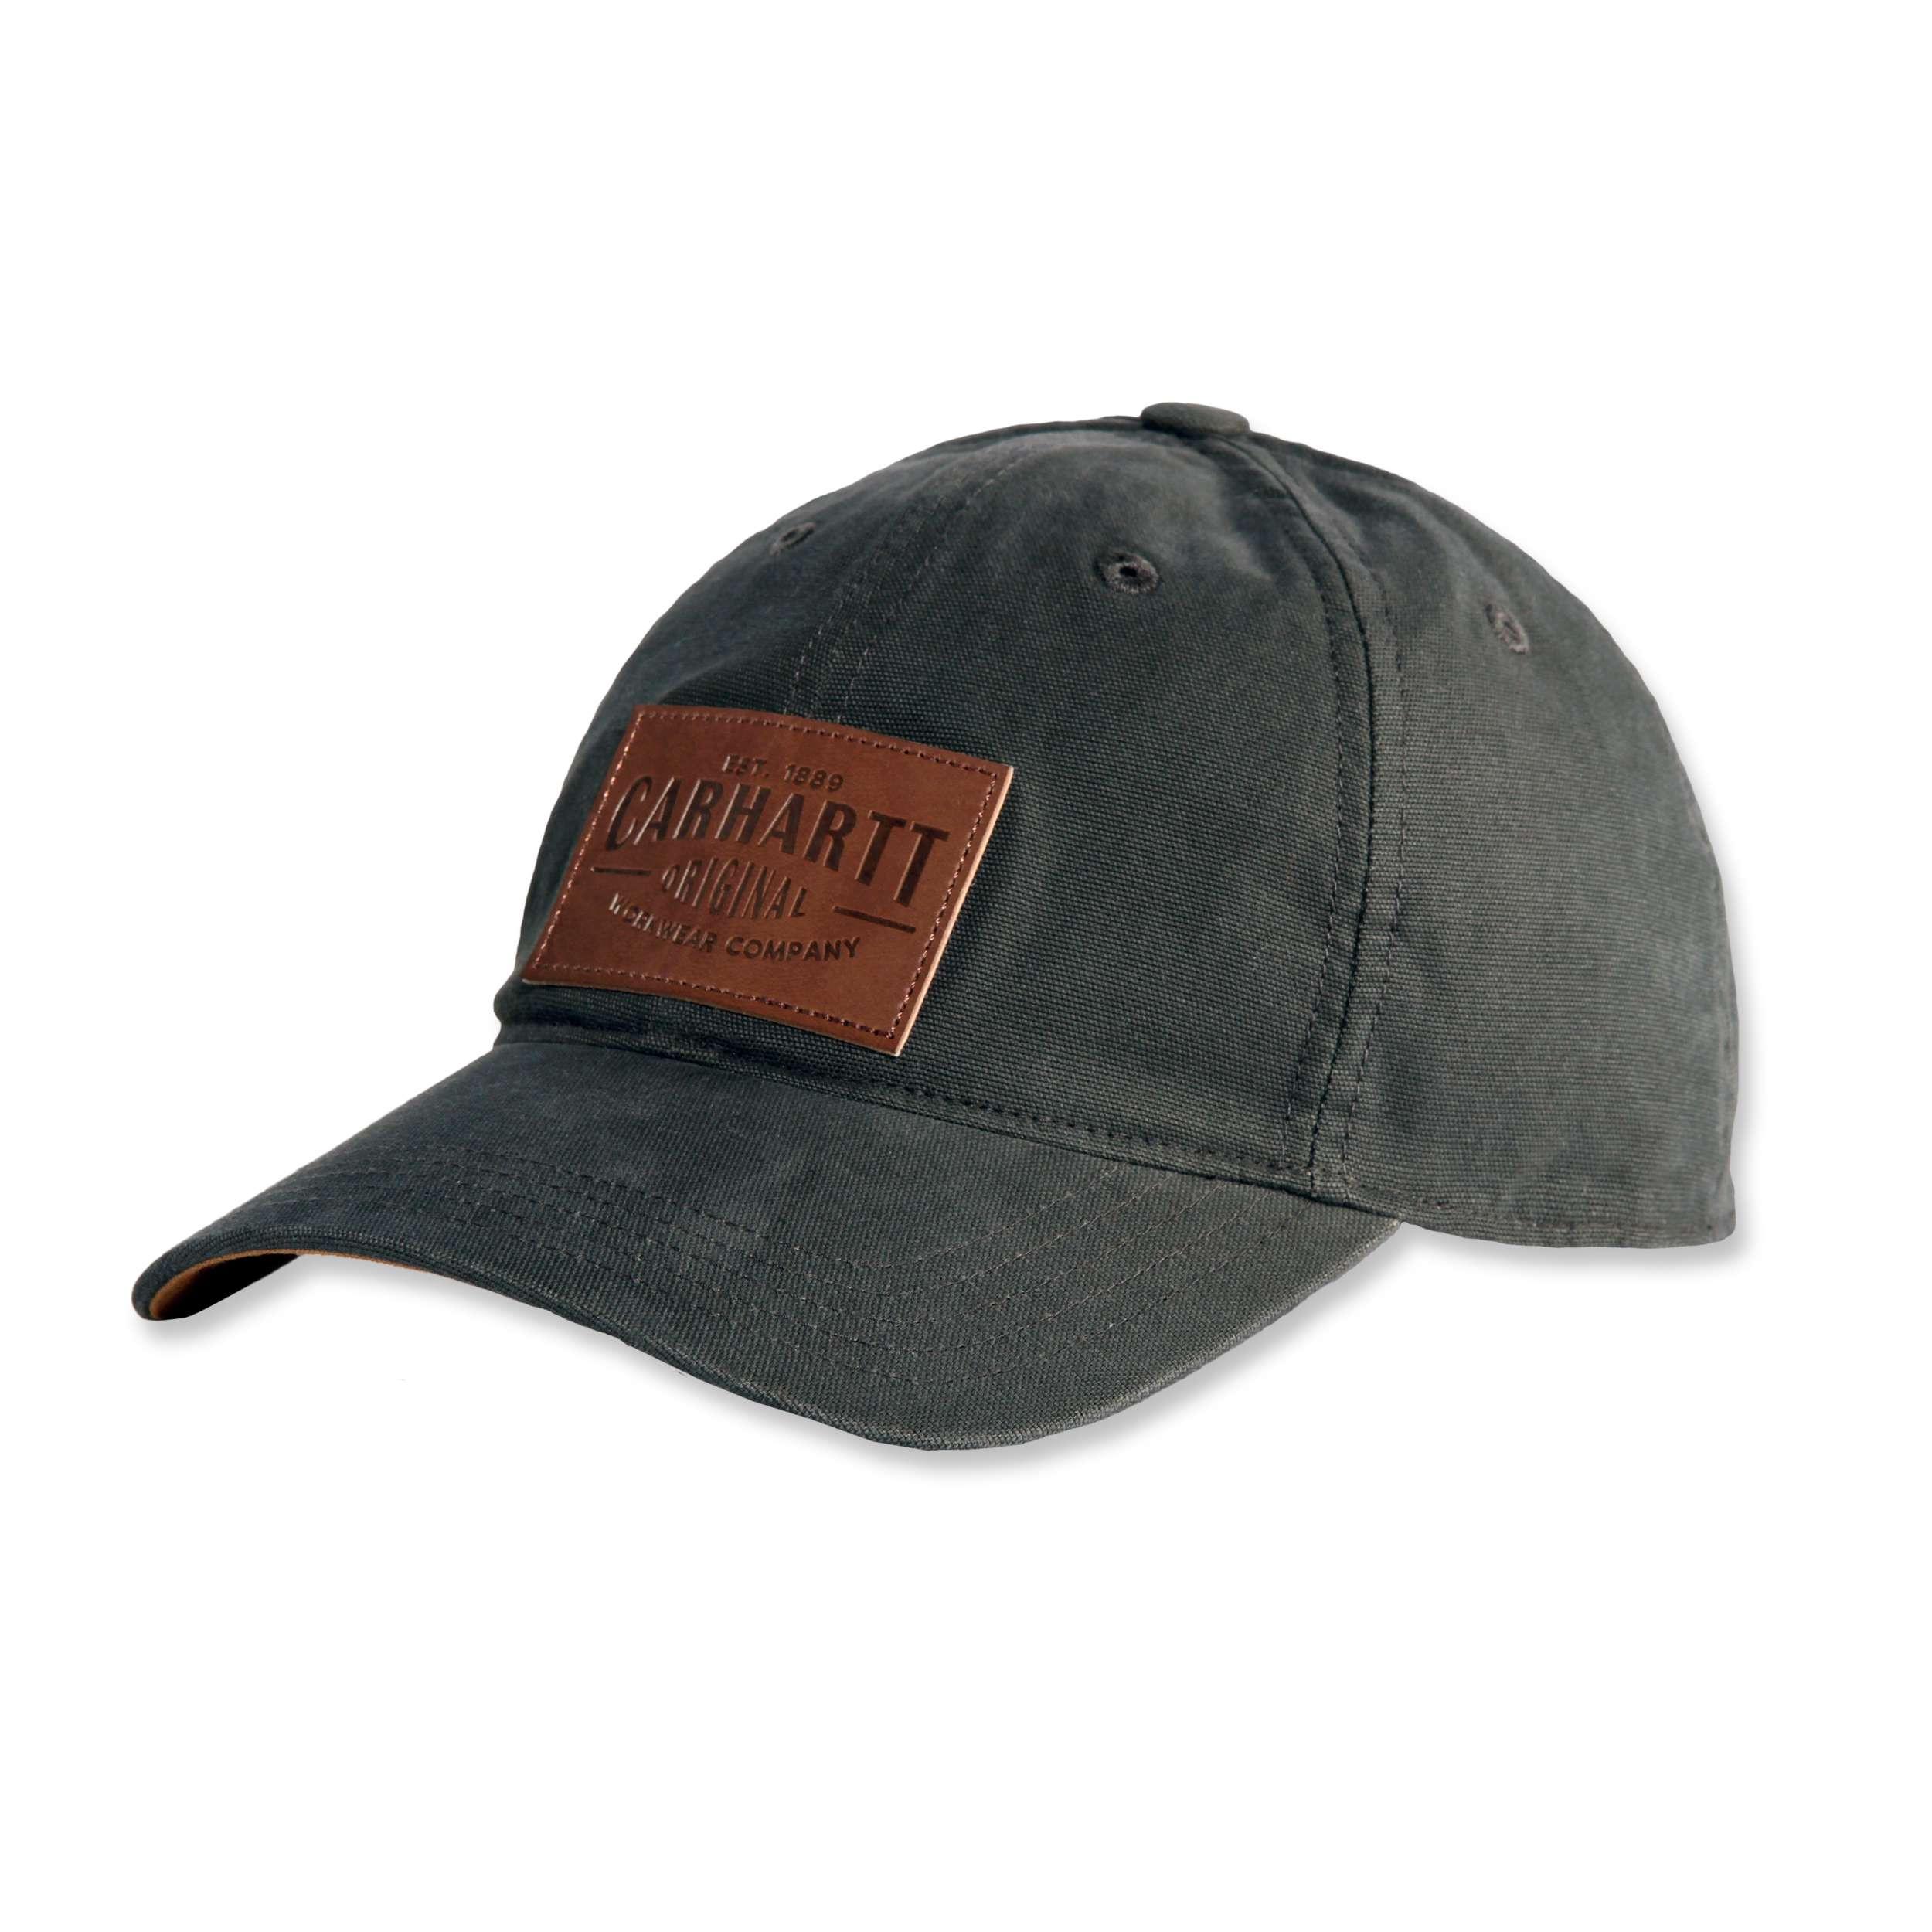 Кепка Carhartt Rigby Stretch Fit Leatherette Patch Cap - 103534 (Peat, L/XL)